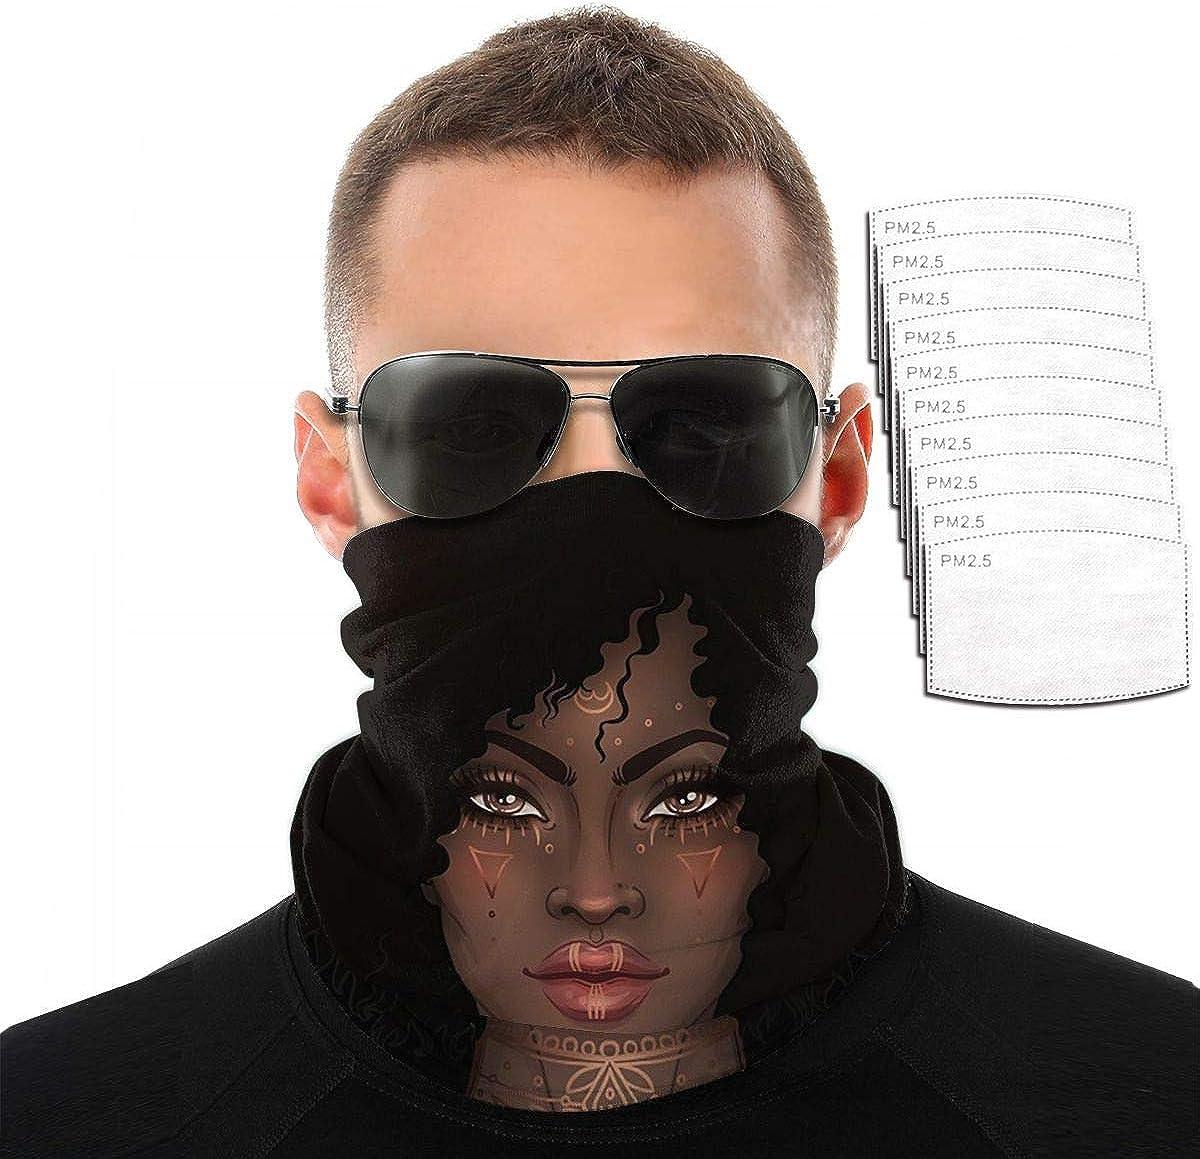 Kiuloam Bandana Face Mask Reusable,African Woman Girl Neck Gaiter Balaclava for Women Men